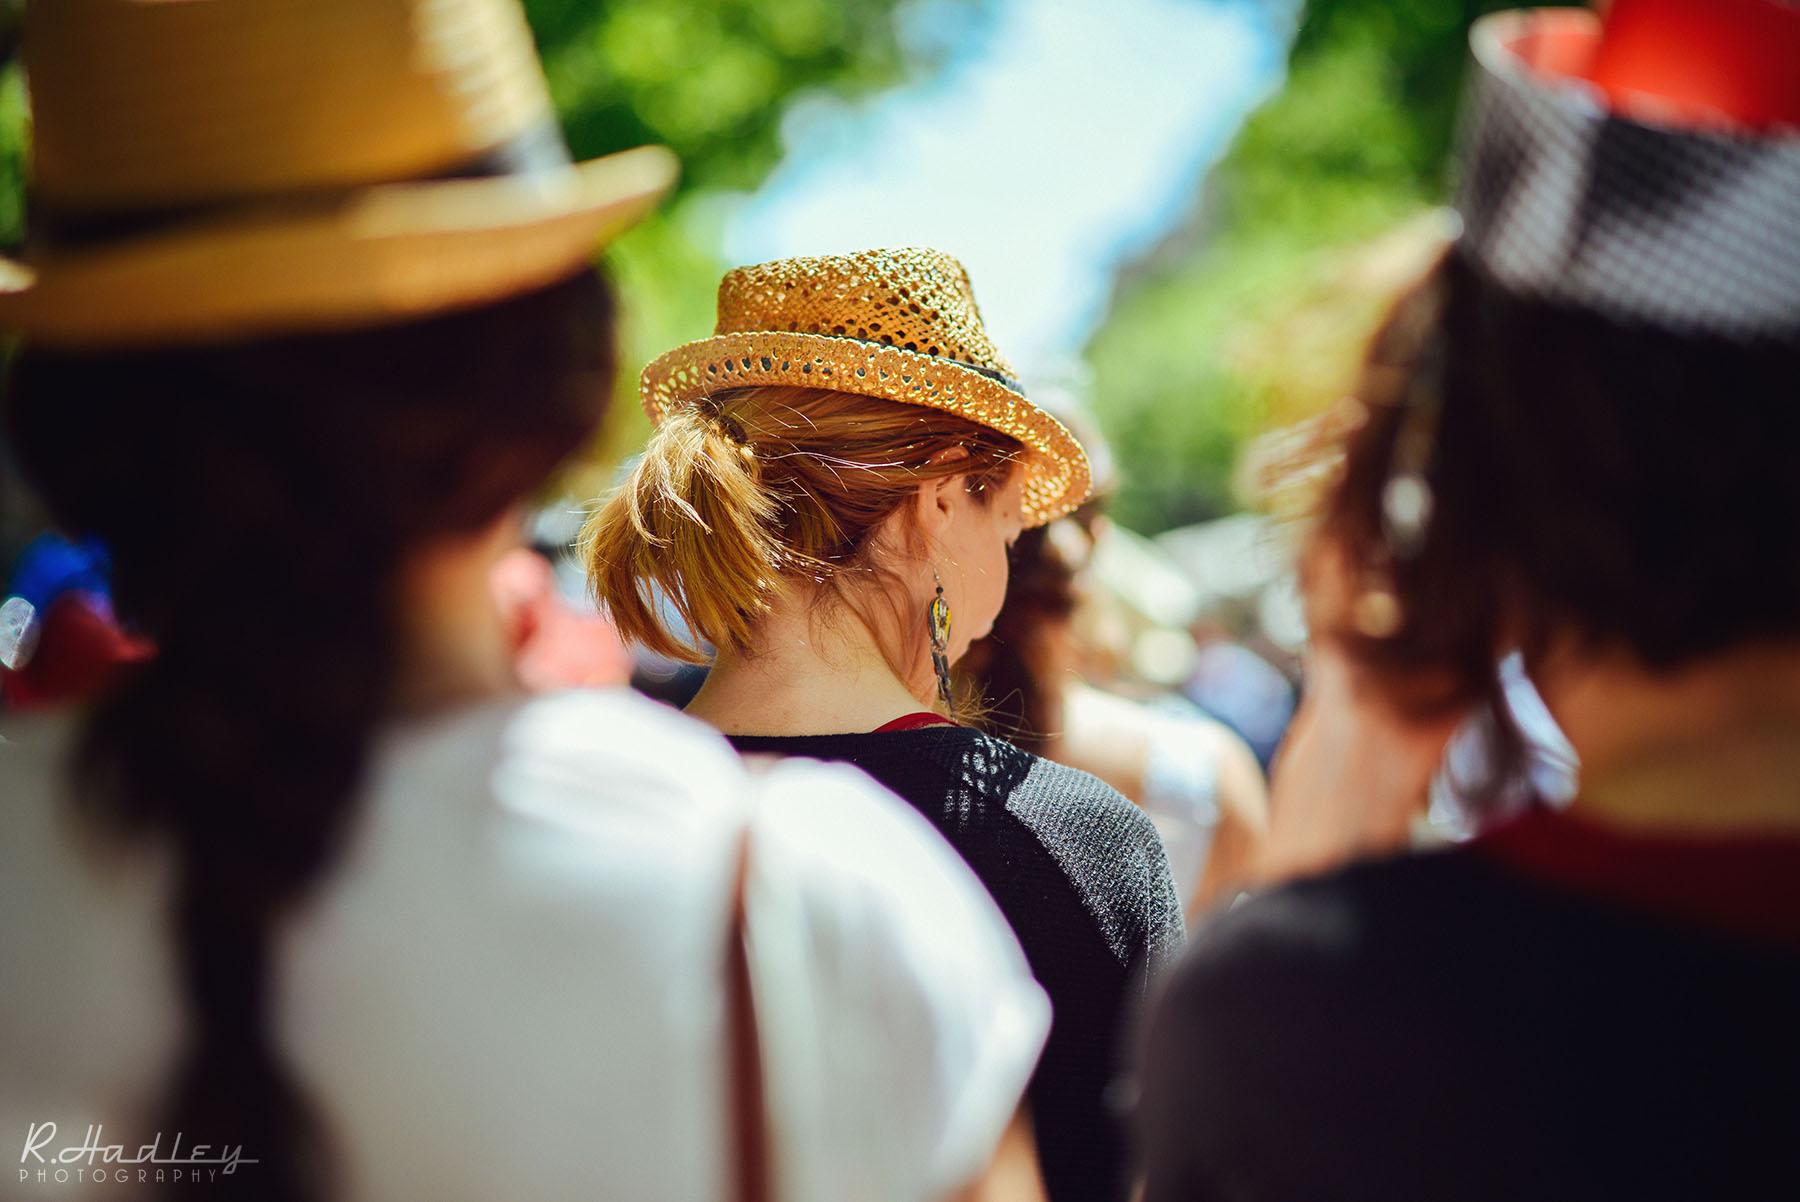 Event | Hat Parade | Barcelona